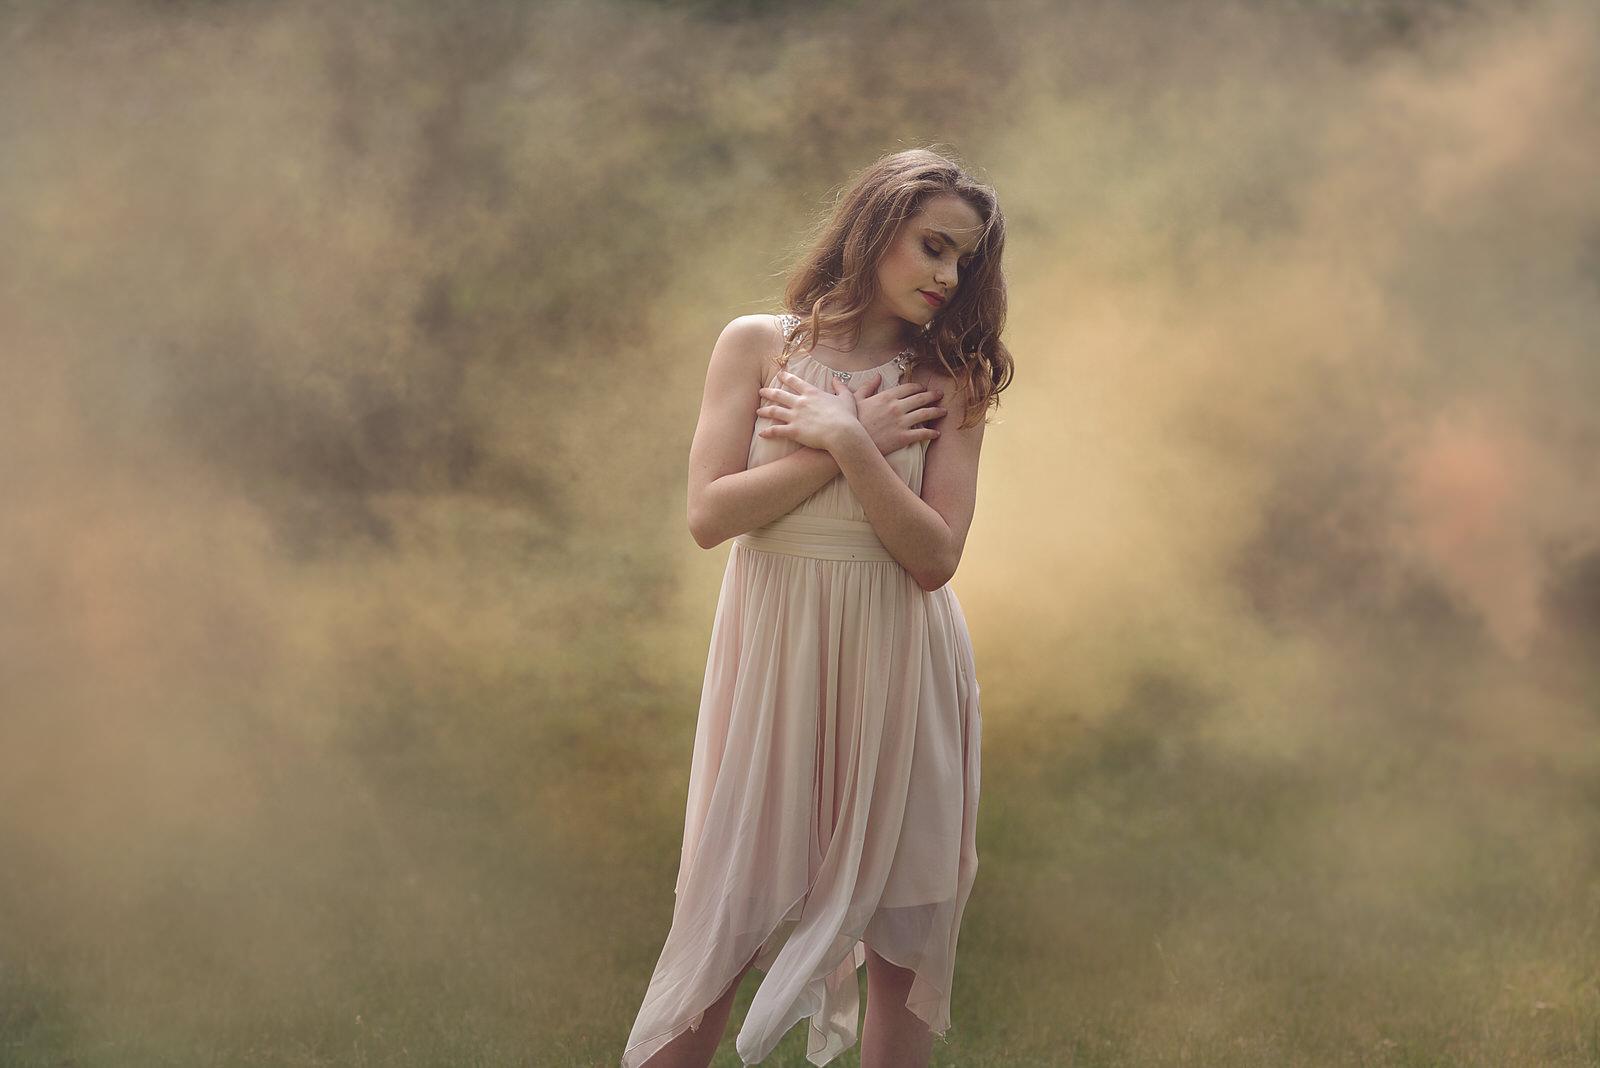 VeroLuce Photography - VeroLuce Photography